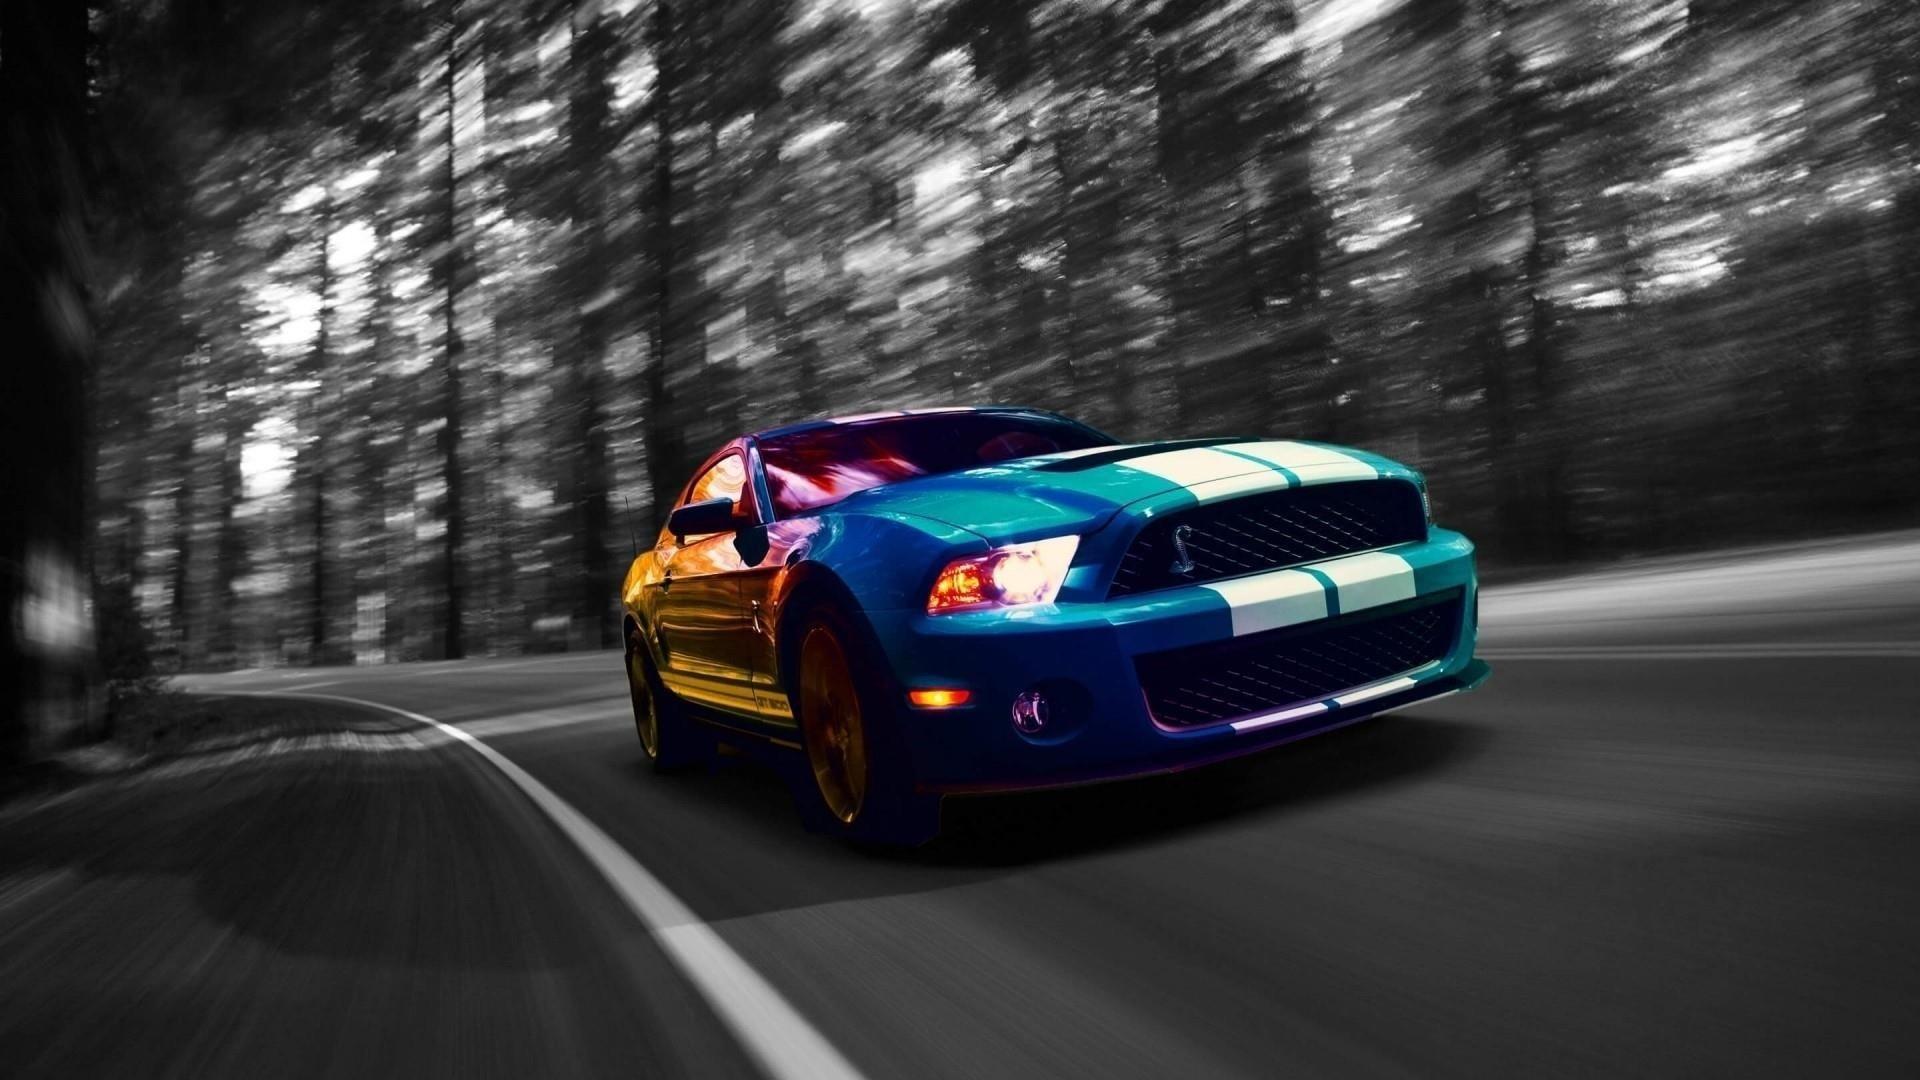 Mustang Mobile Wallpapers